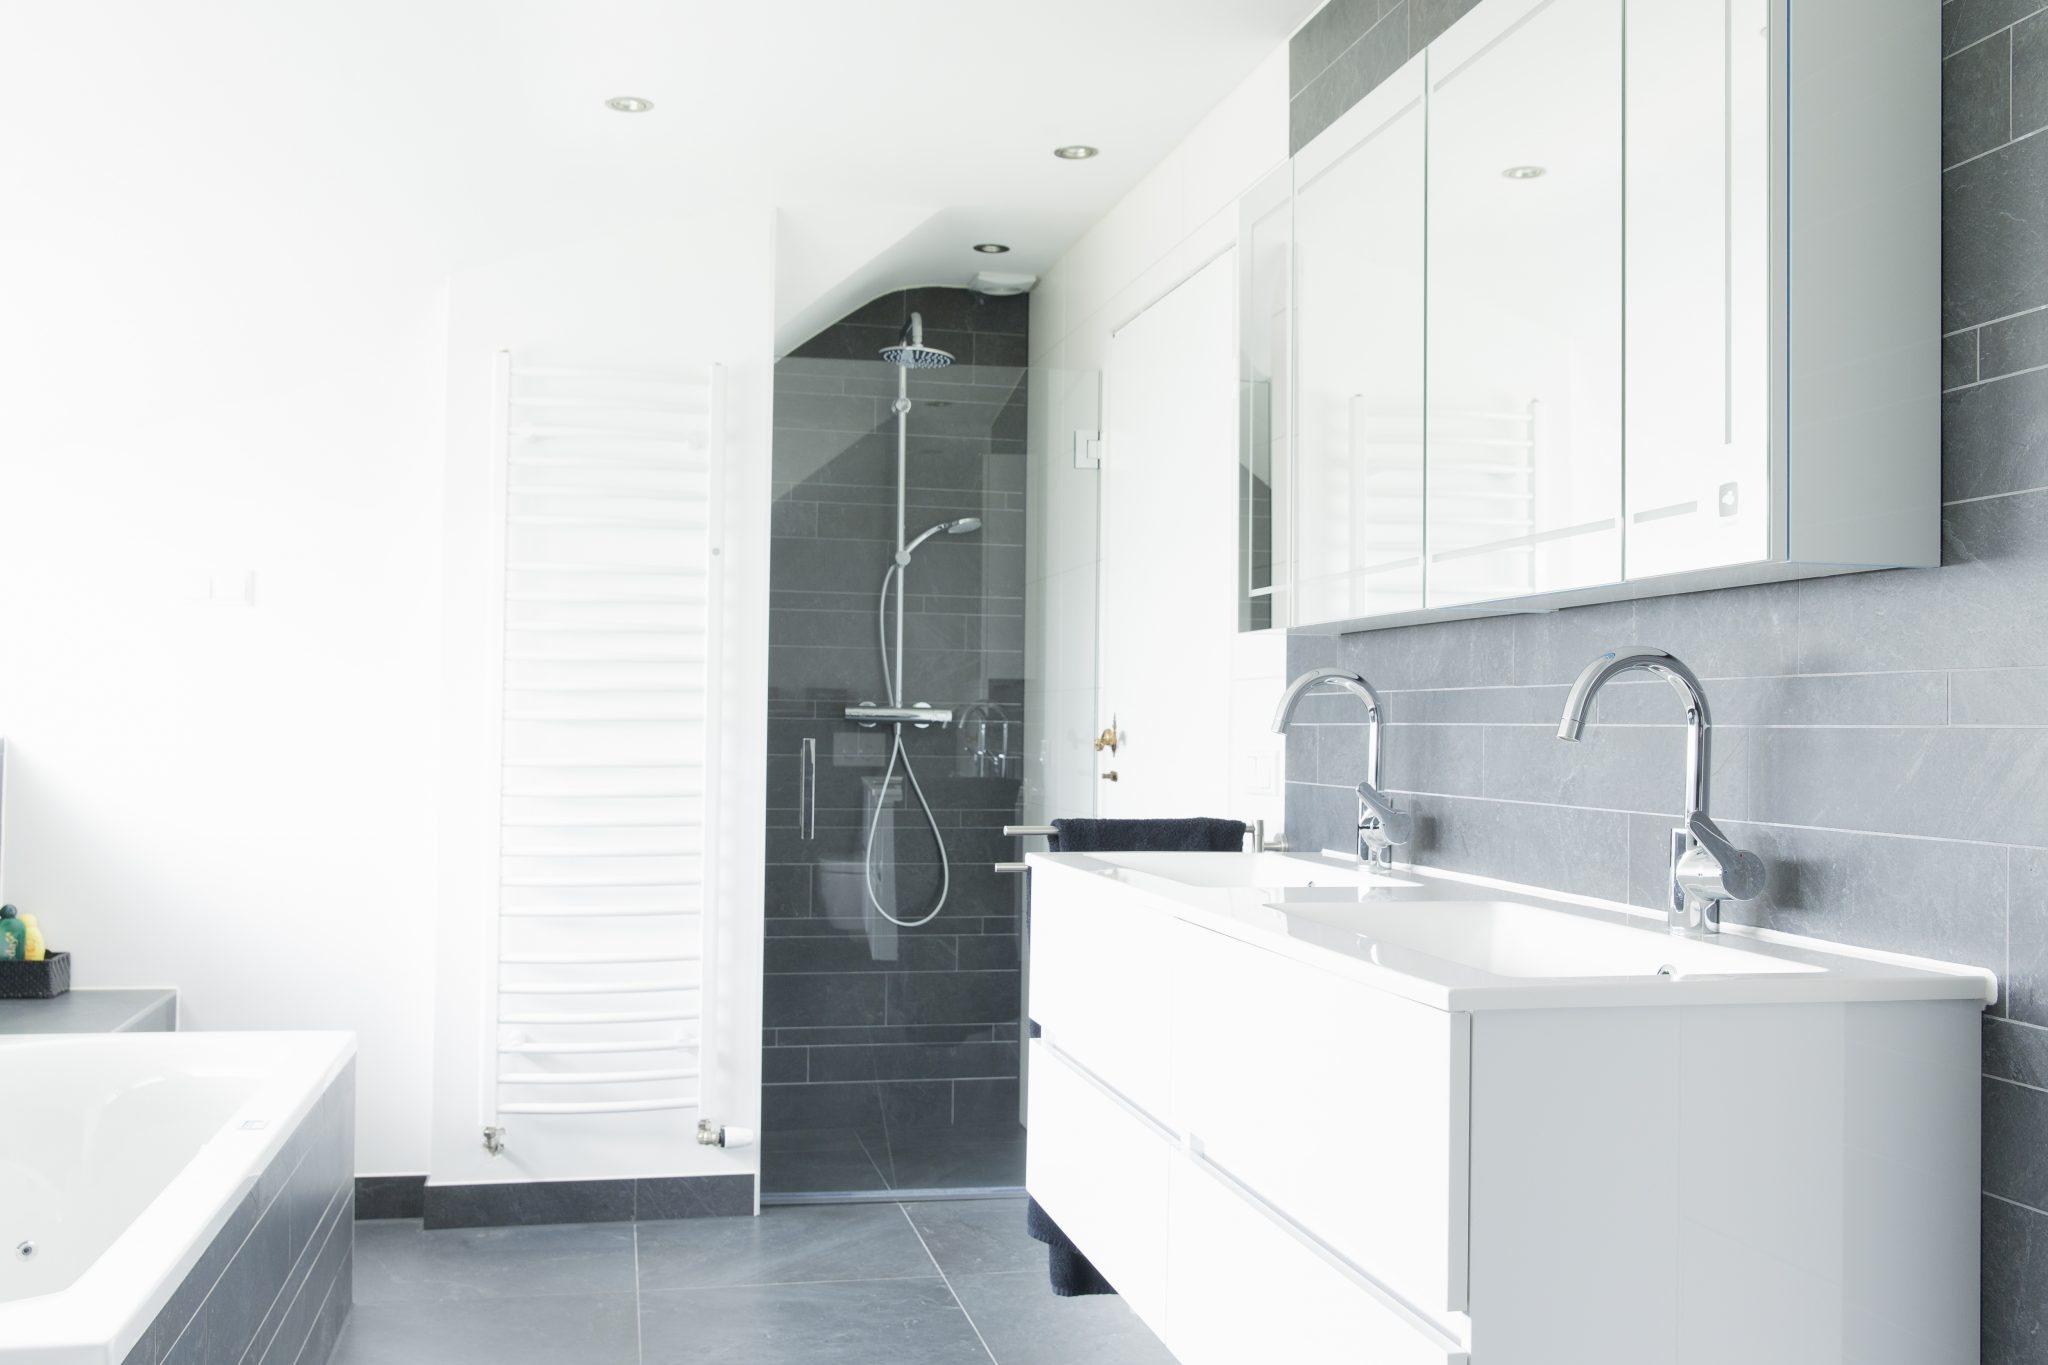 badkamer sanitair hengelo ~ pussyfuck for ., Deco ideeën